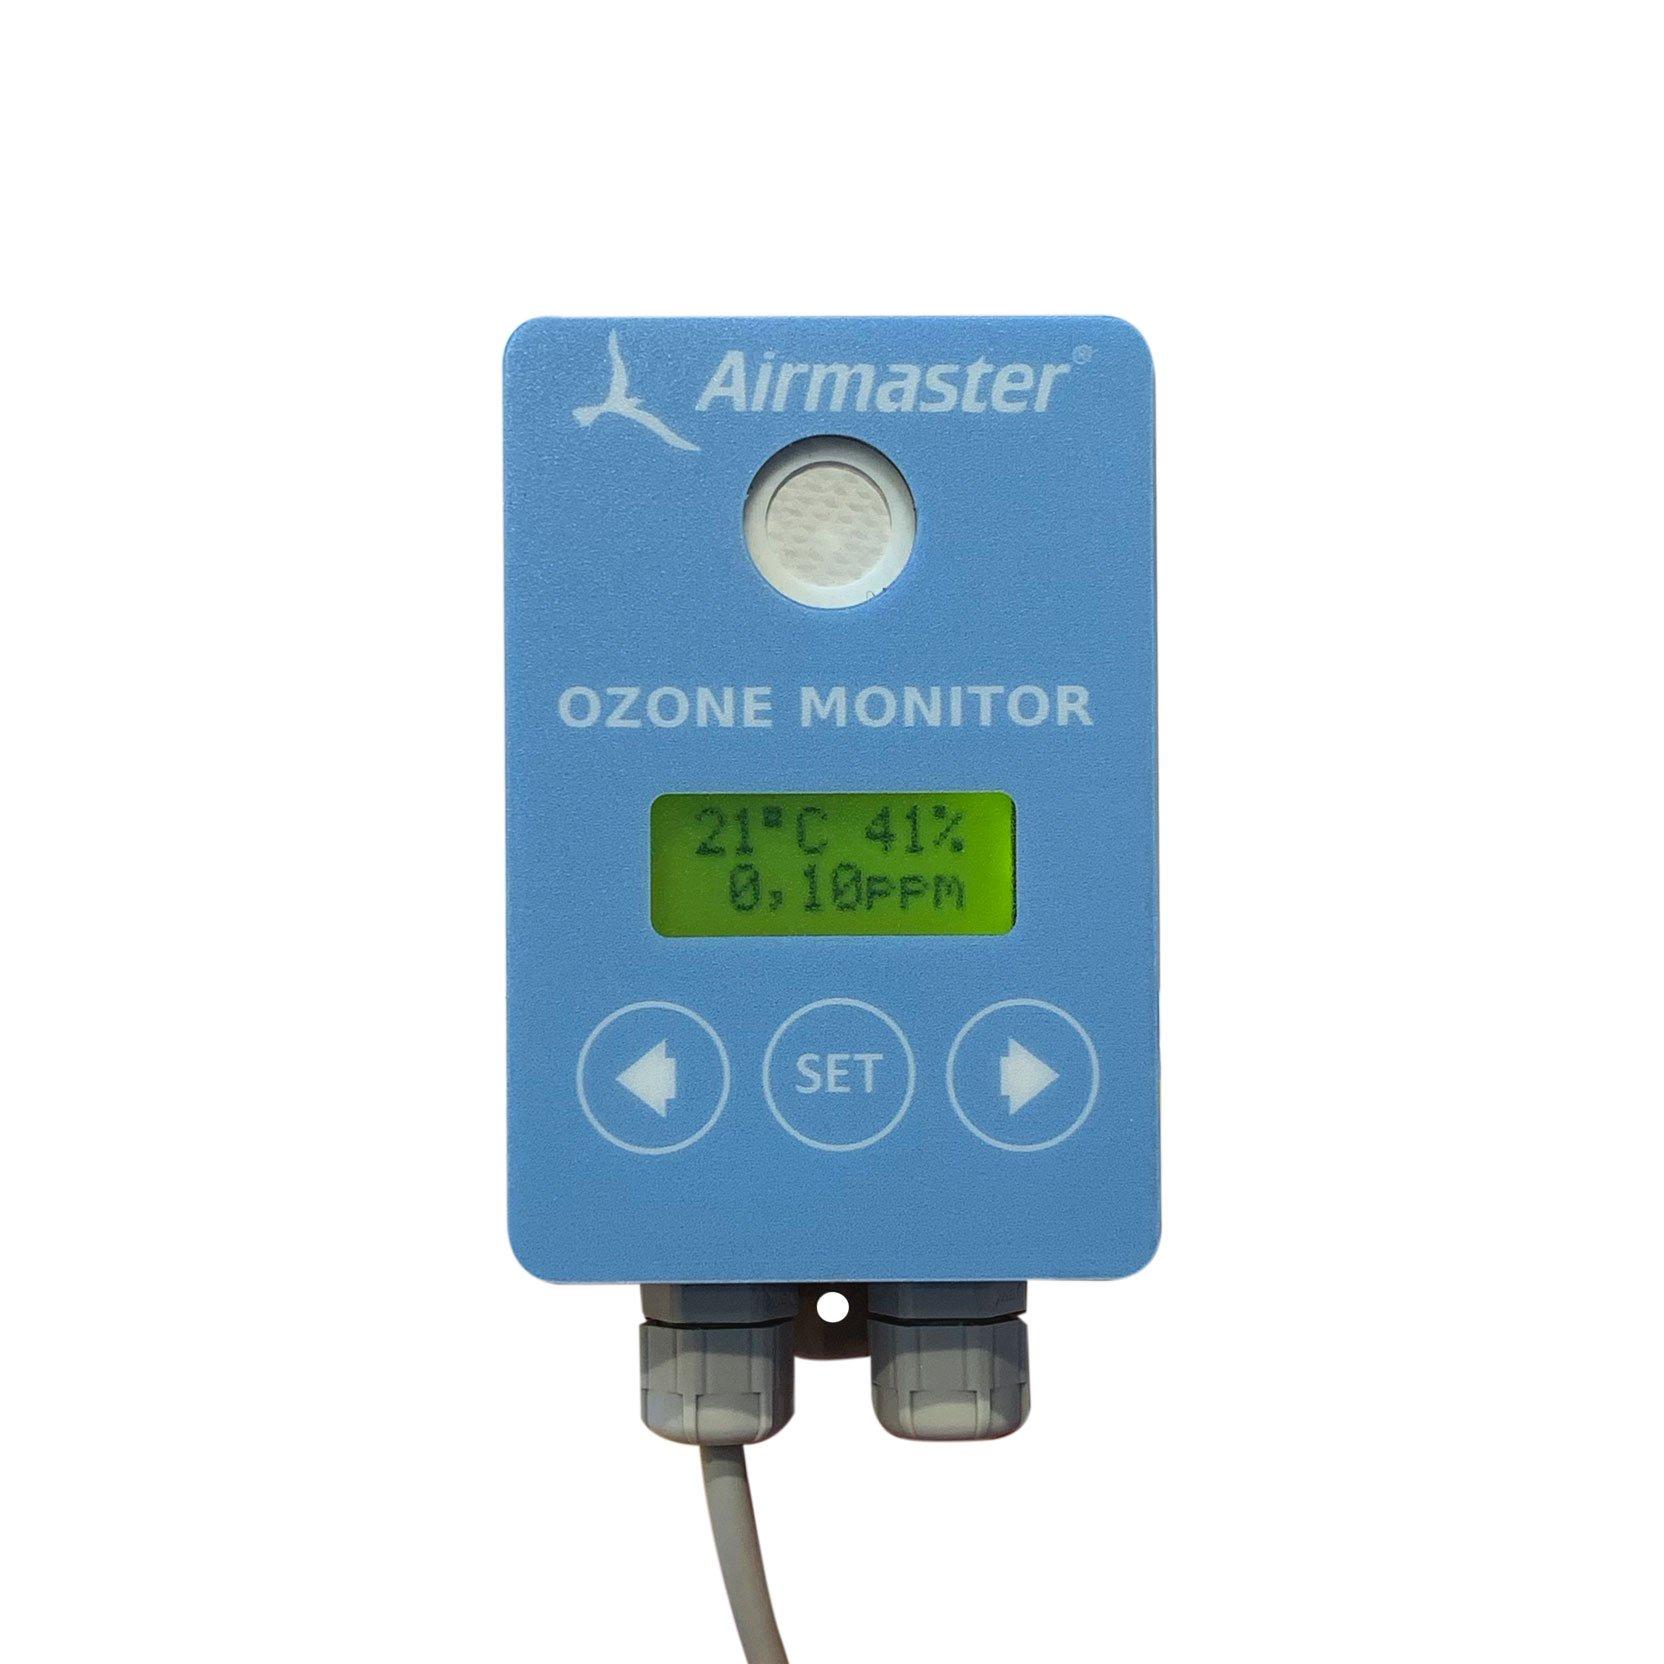 Airmaster ozonsensor